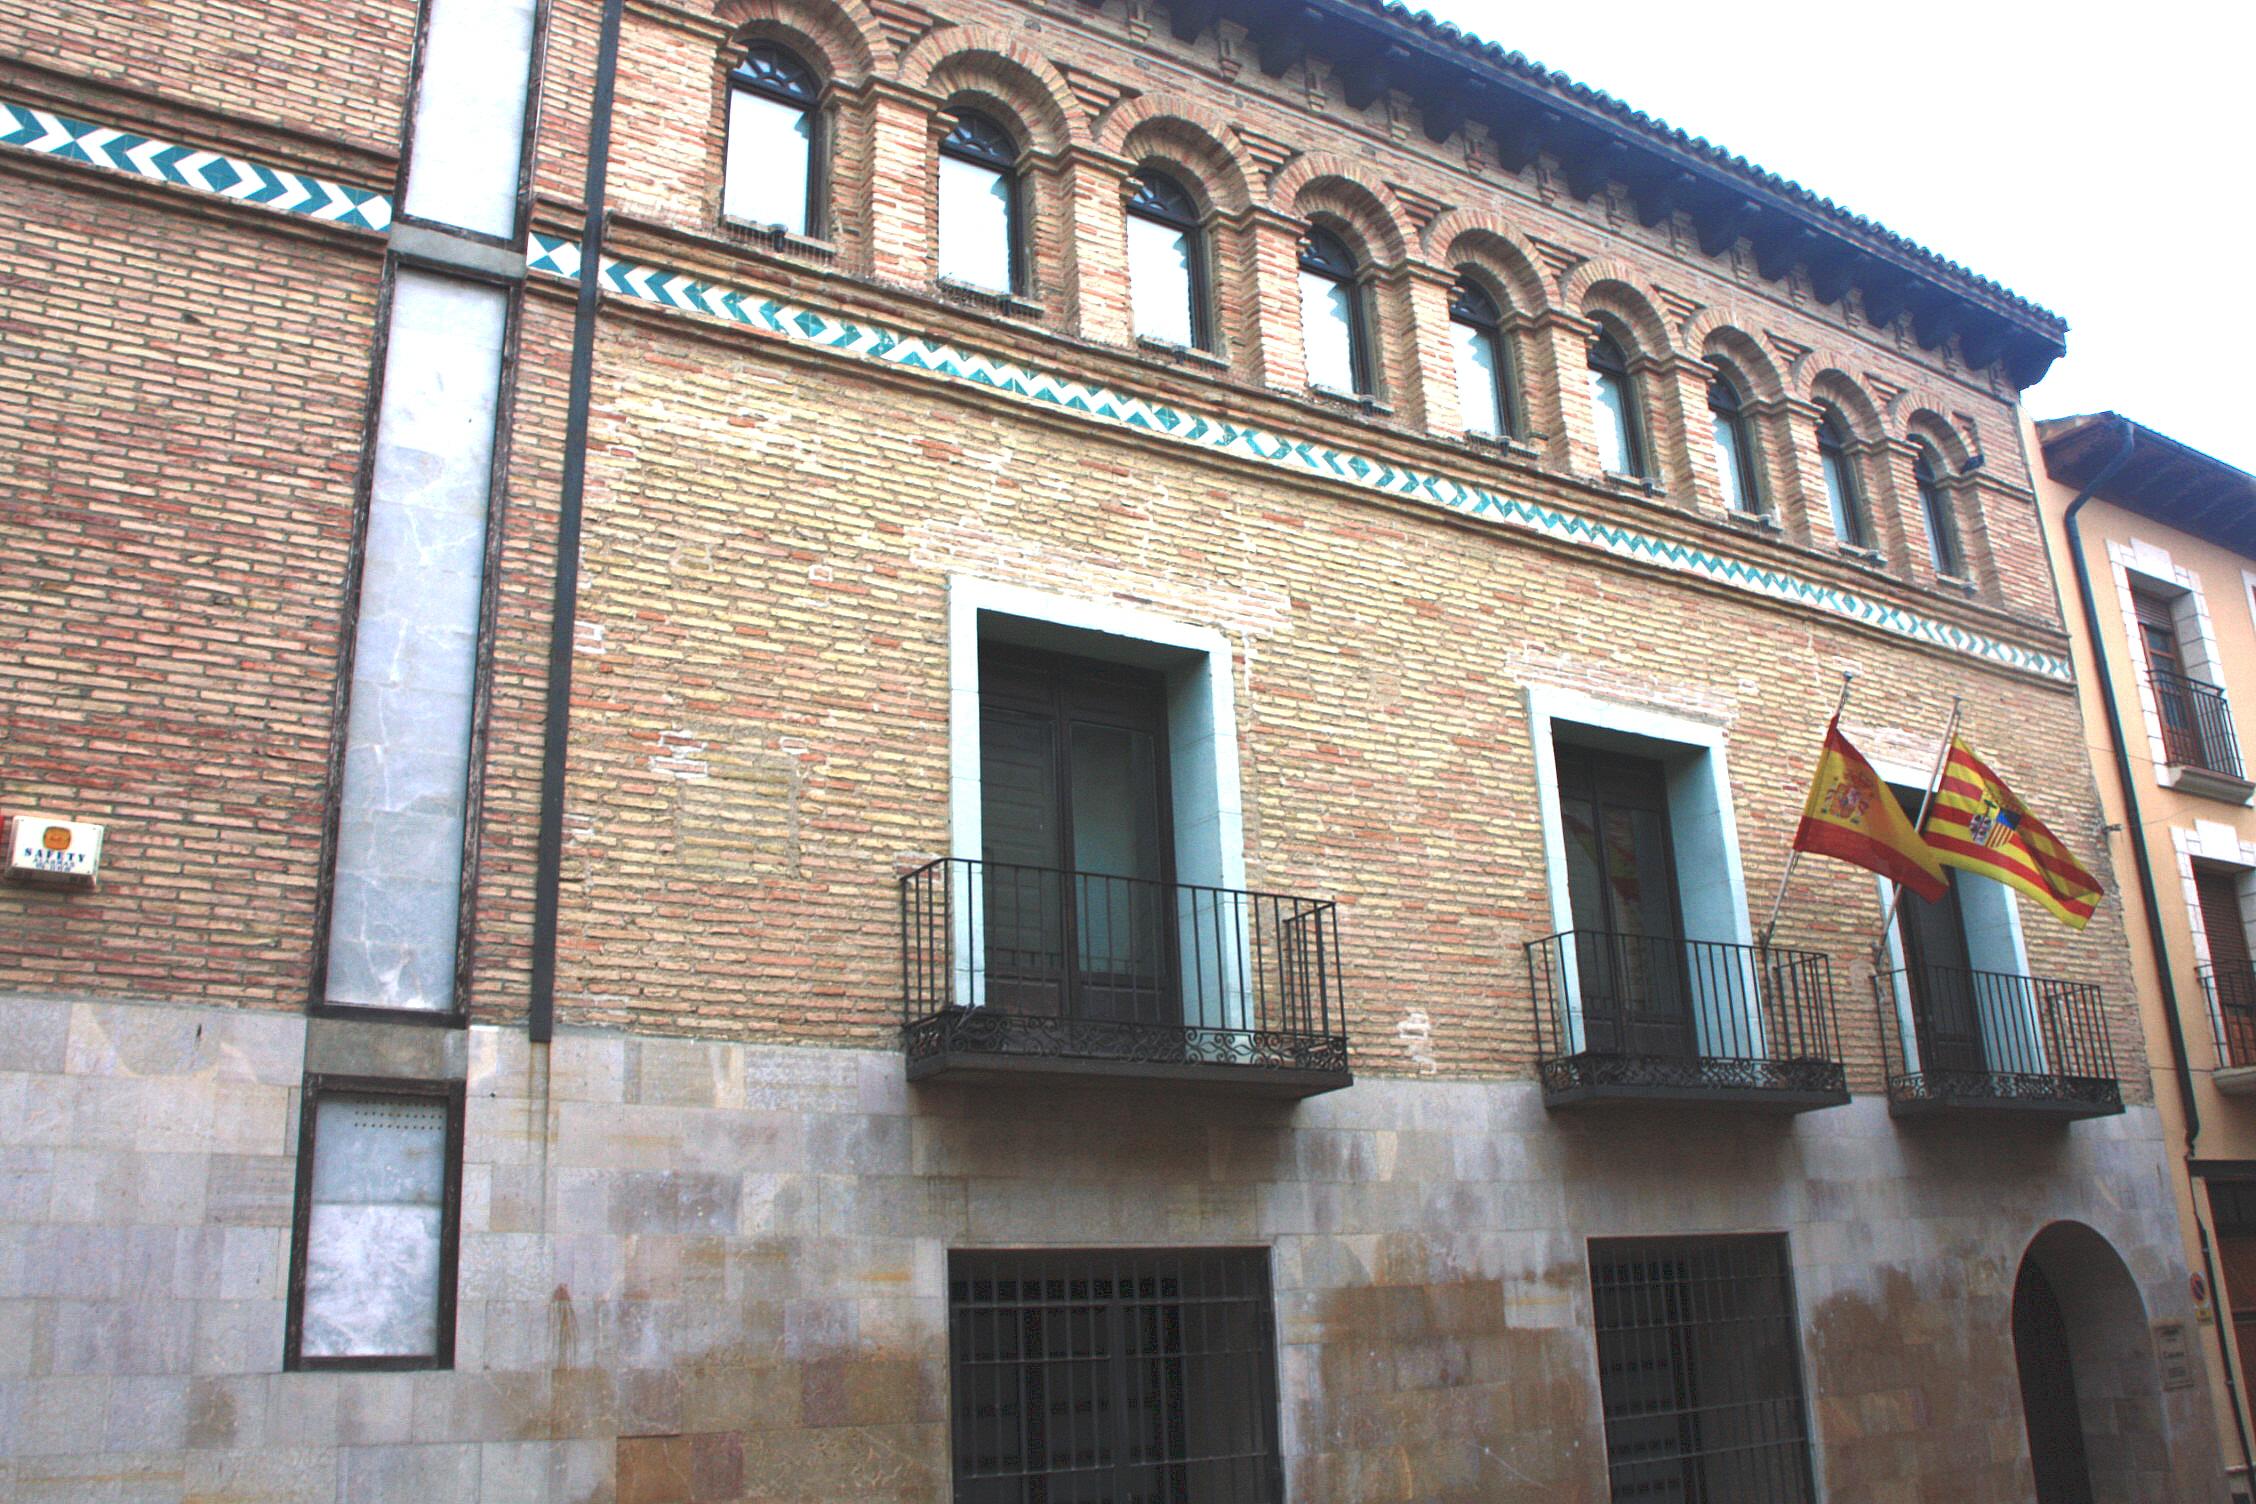 Foto centro hist rico ejea de los caballeros zaragoza - Centro historico de madrid ...